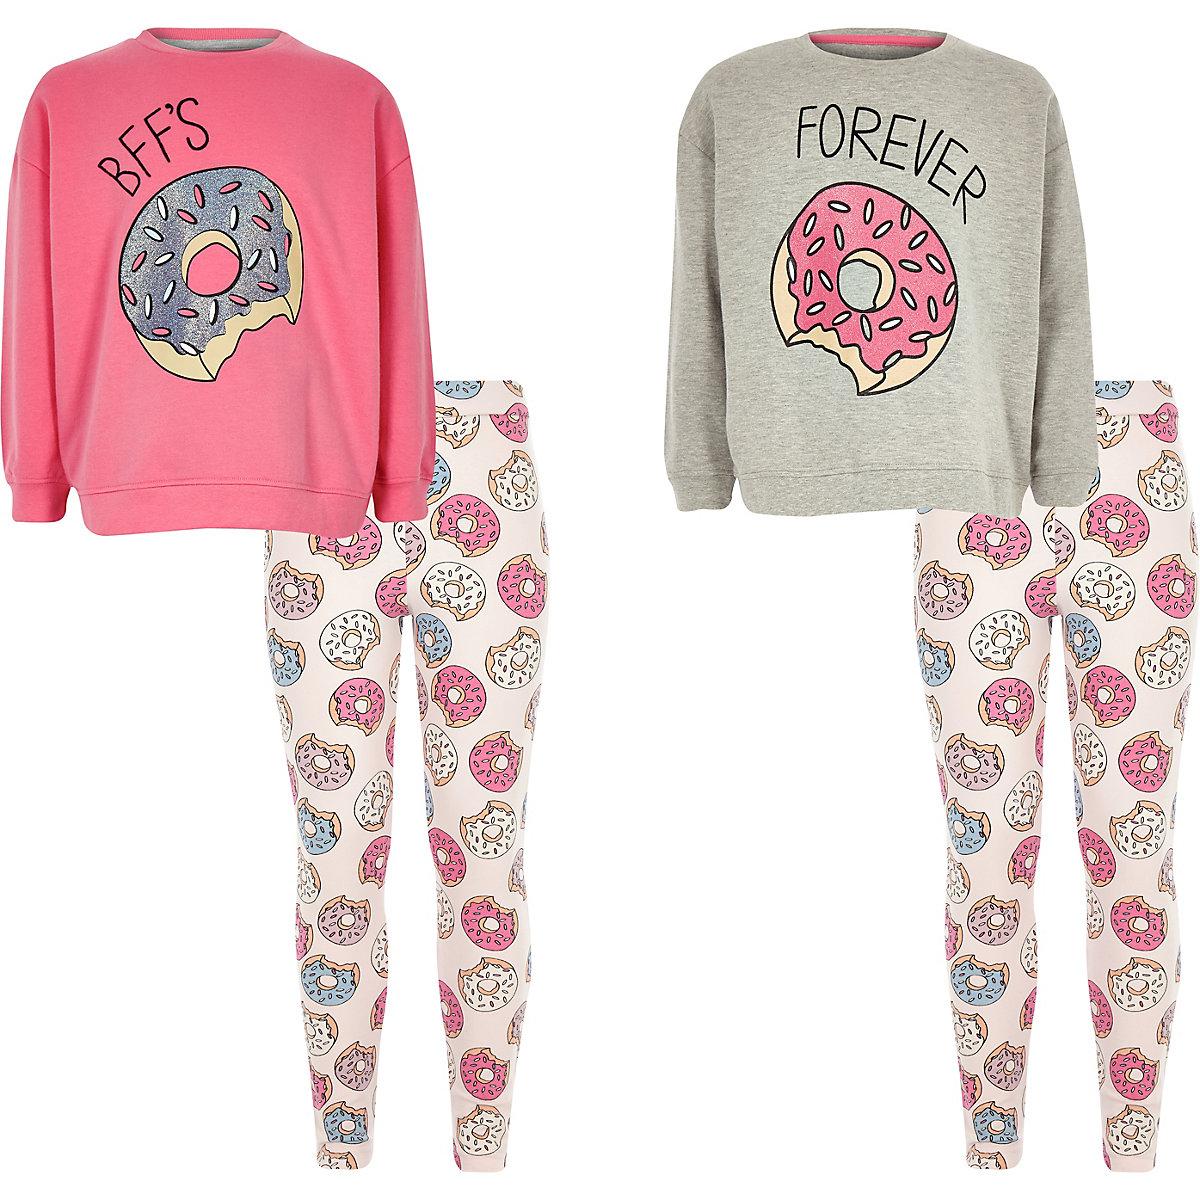 Girls grey BFF donut pajama set two pack